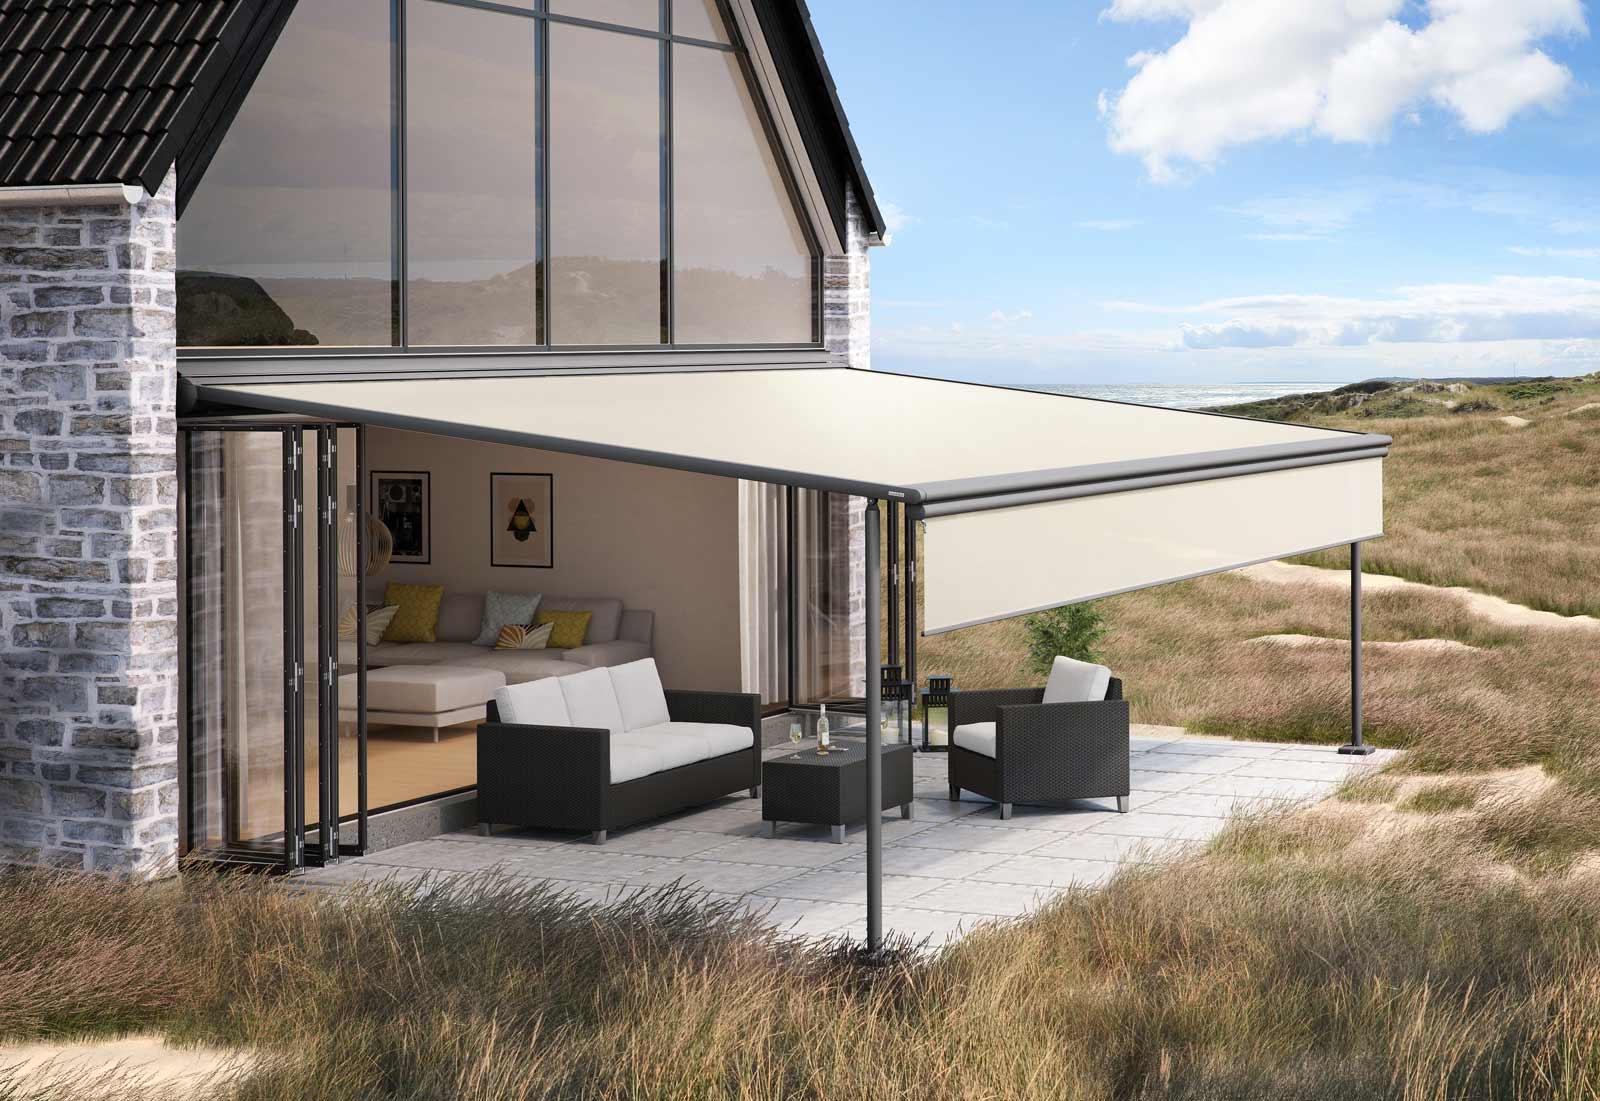 markisen rotenburg bremerv rde harsefeld sottrum sittensen. Black Bedroom Furniture Sets. Home Design Ideas